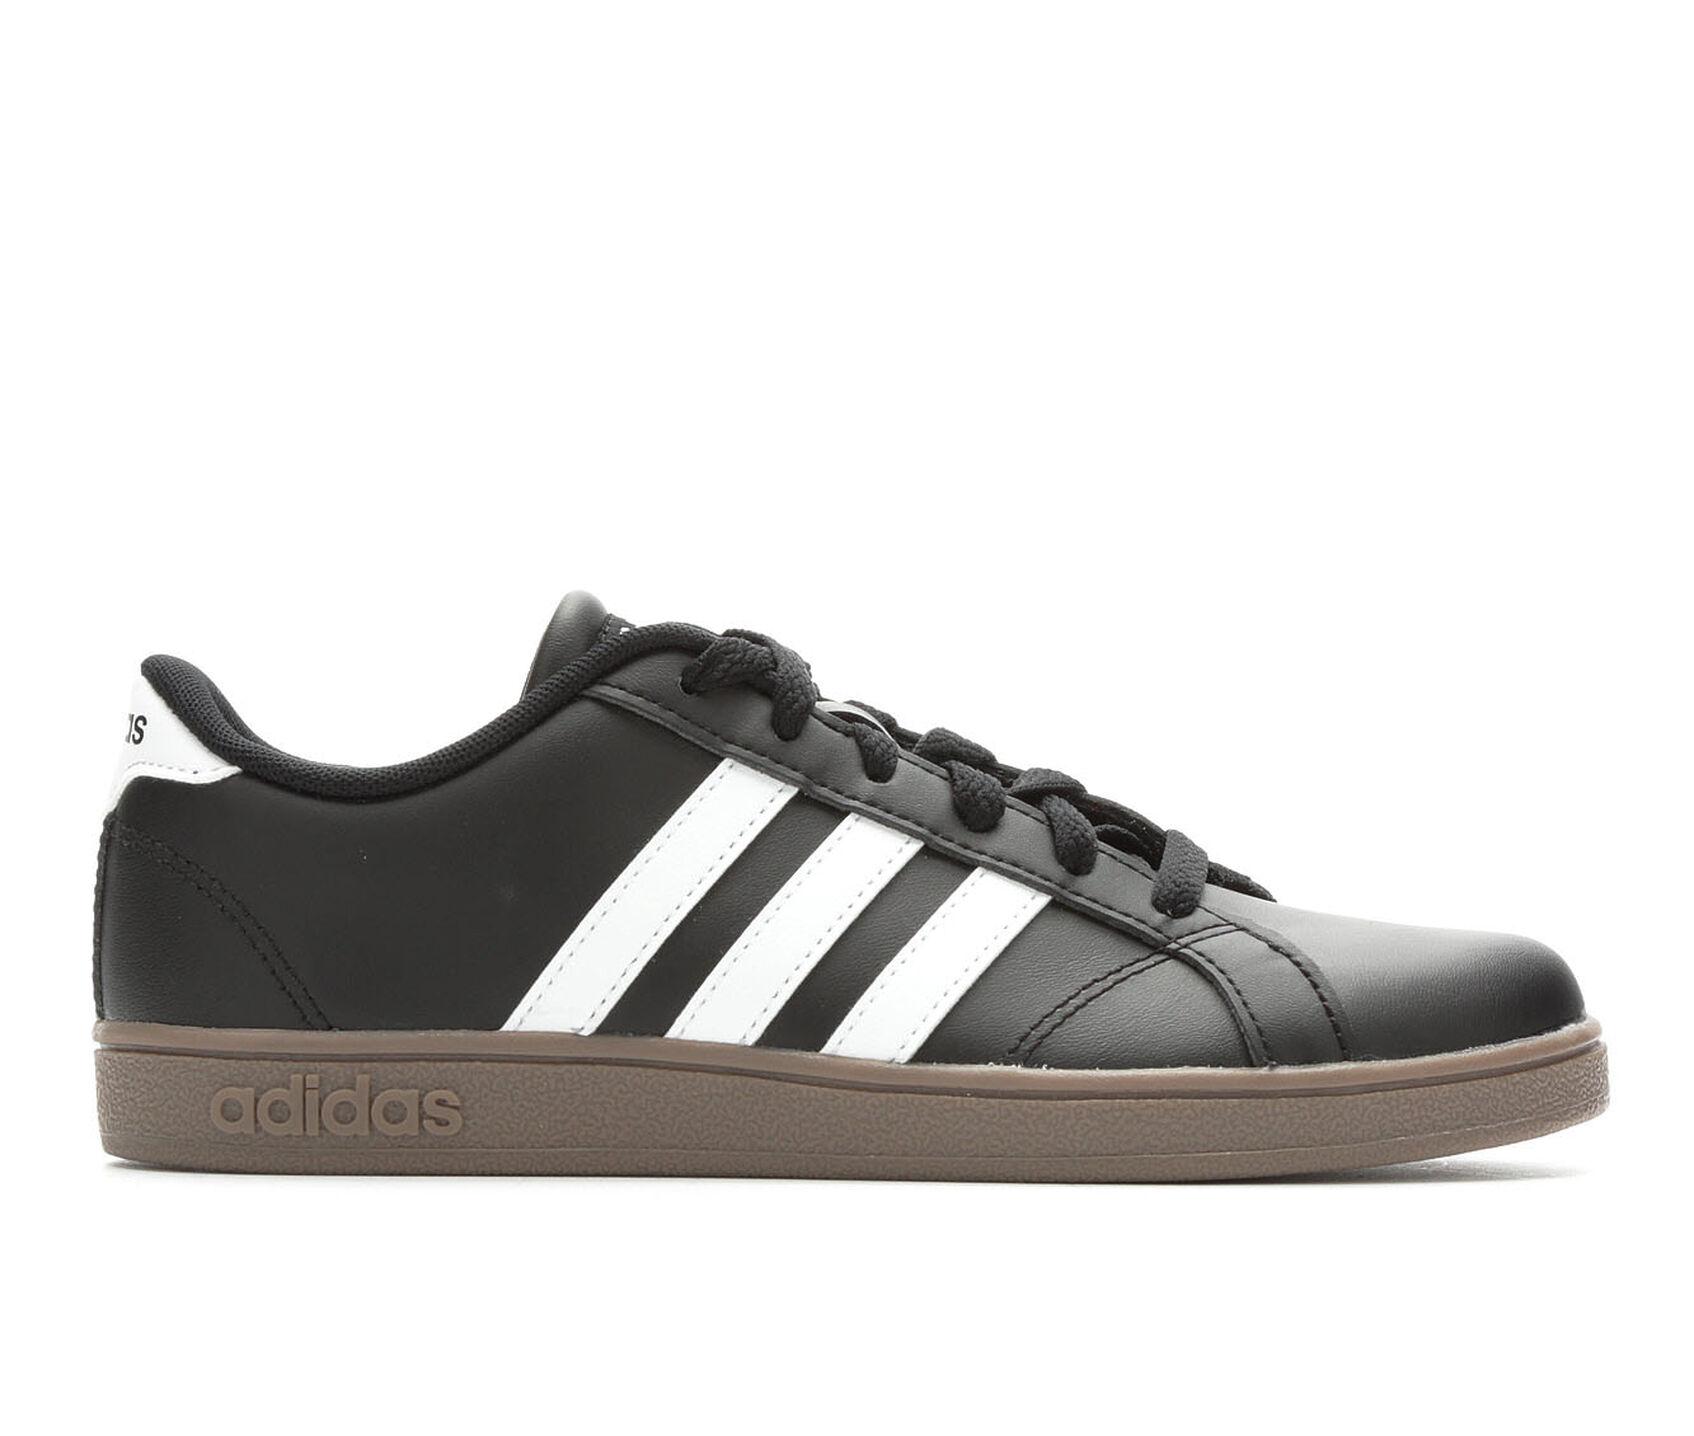 cbc9851ec53 ... Adidas Little Kid  amp  Big Kid Baseline Sneakers. Previous